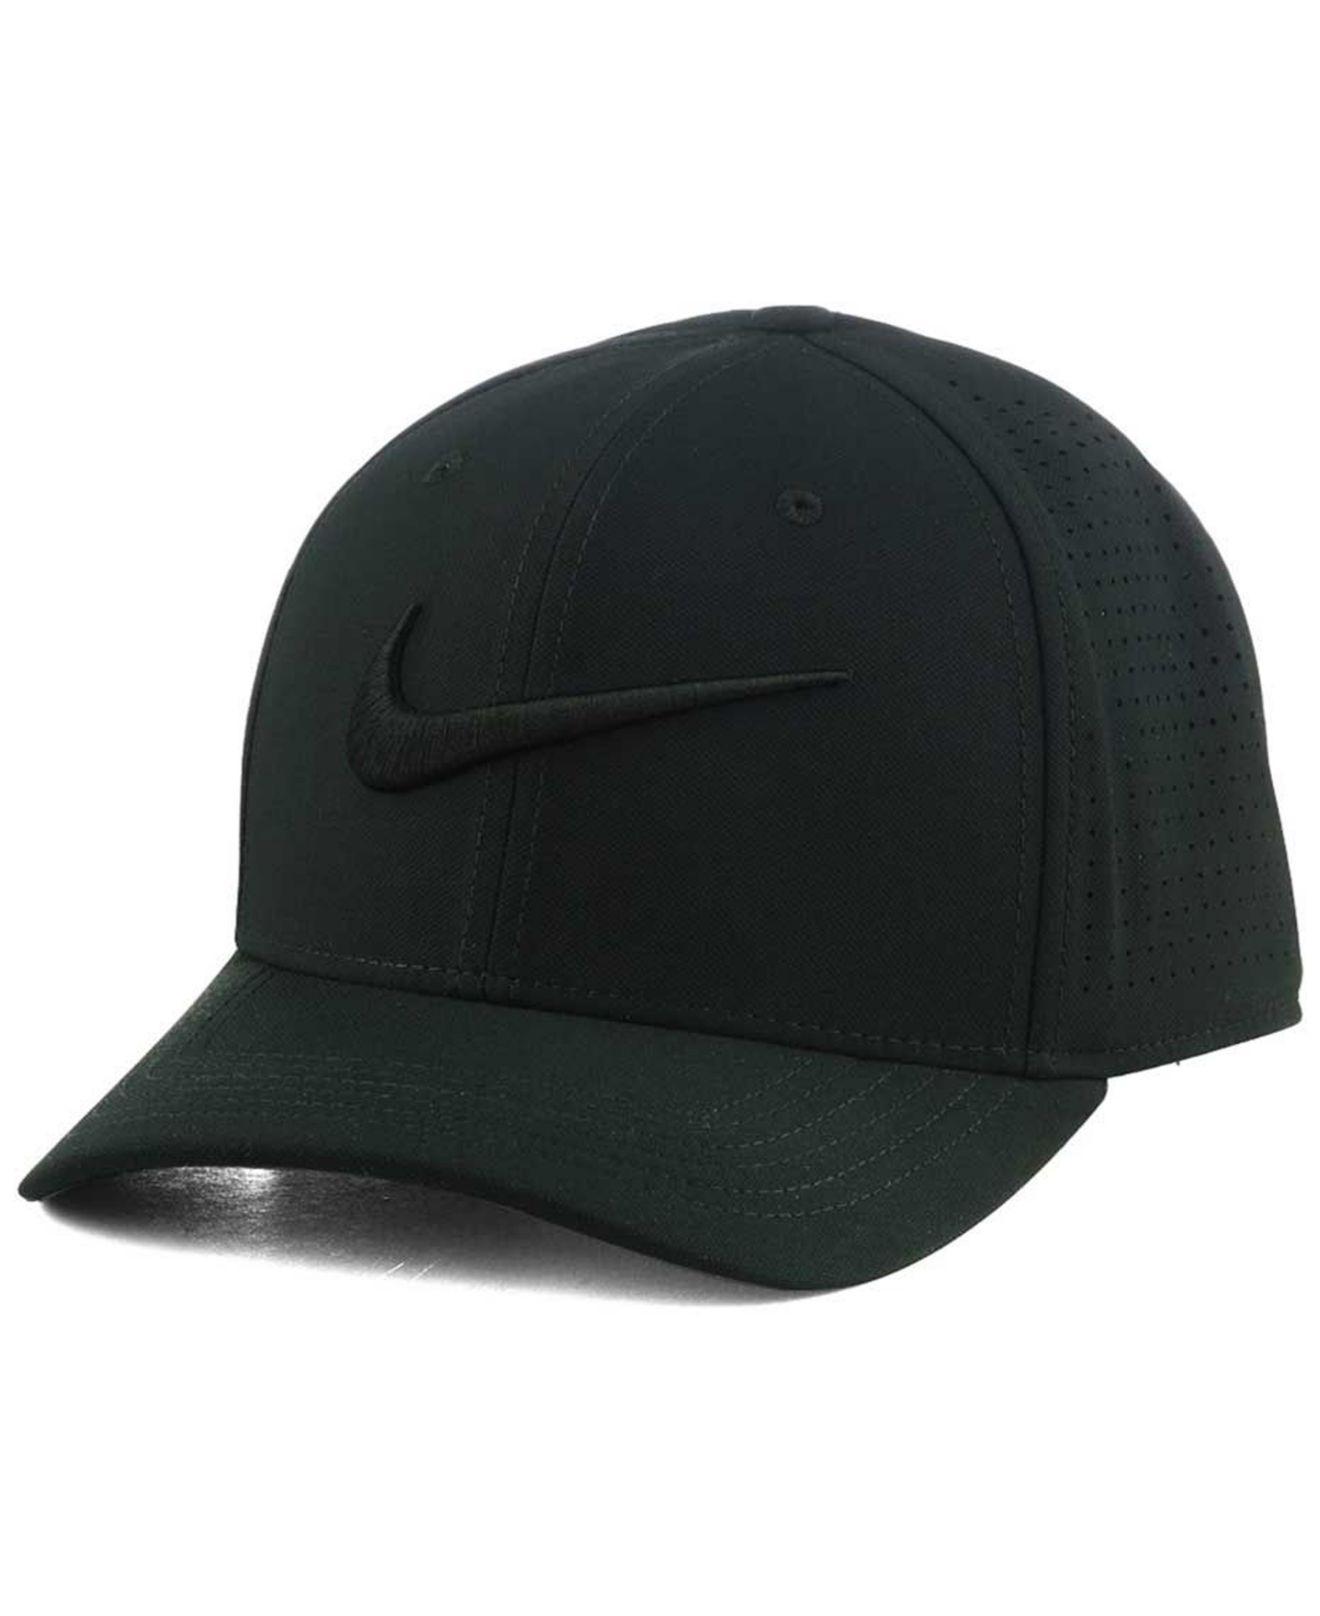 51bc5131b53 Lyst - Nike Vapor Flex Ii Cap in Black for Men